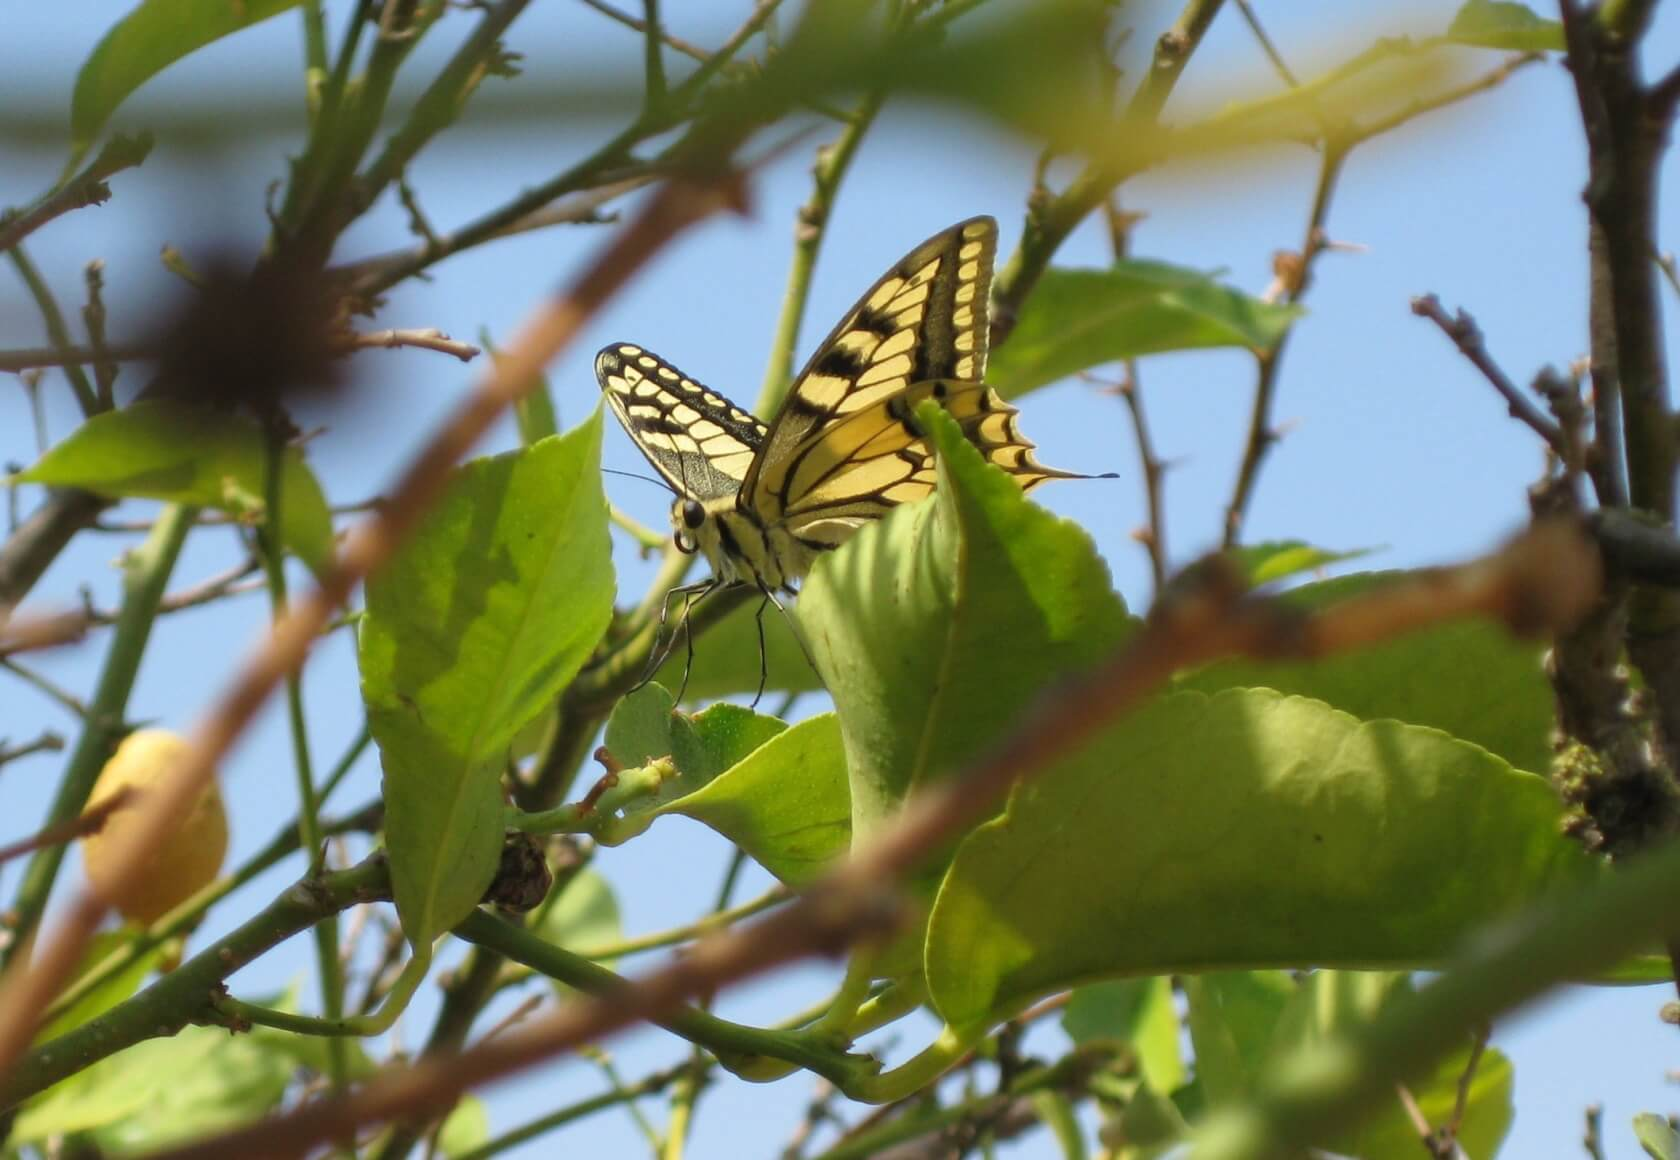 Schwalbenschwanz Schmetterling in Algarve Zitronenbaum